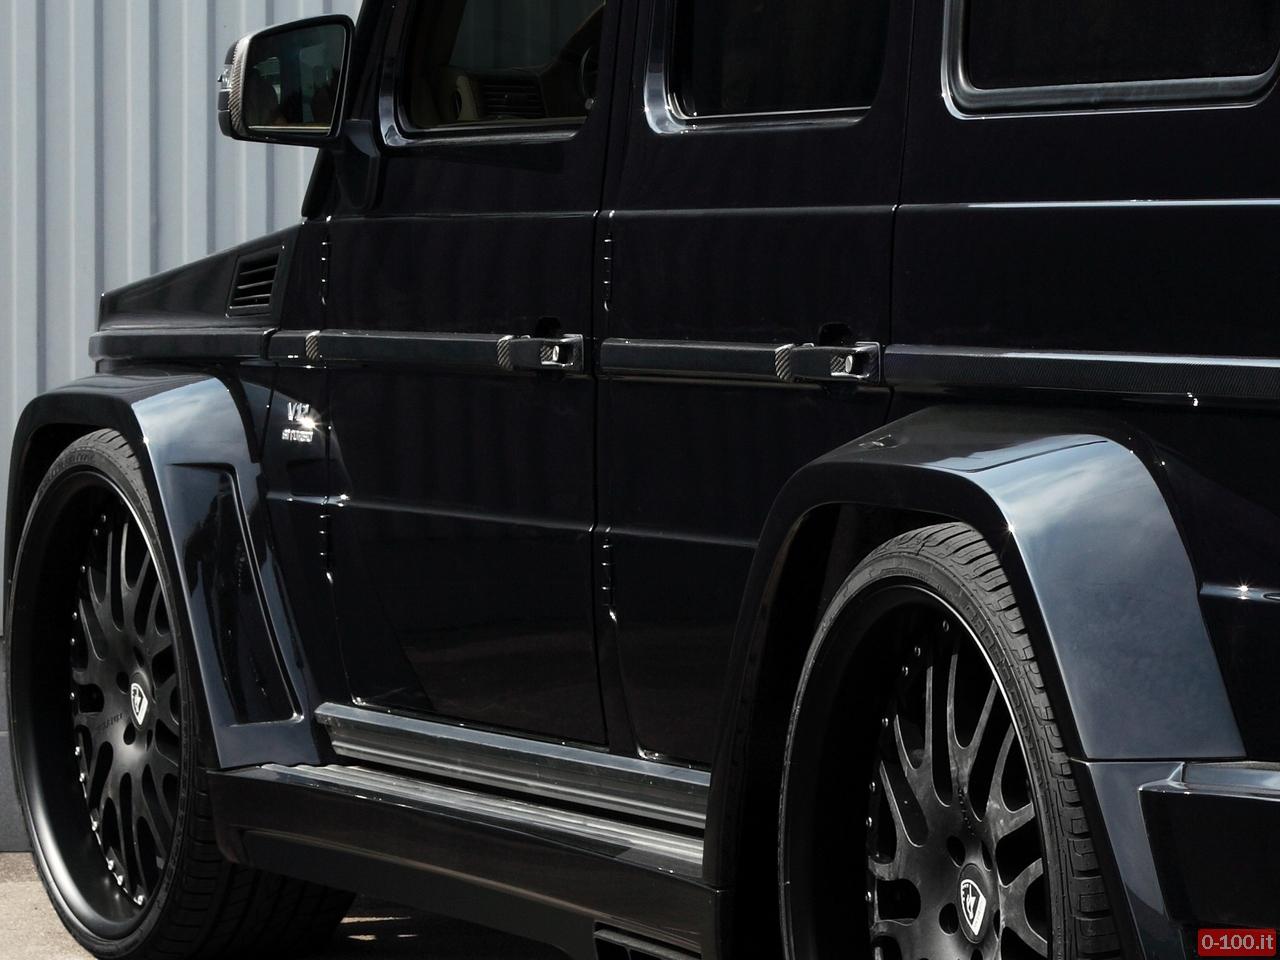 top-car-hamann-spyridon-mercedes-g65-amg_0-100_13